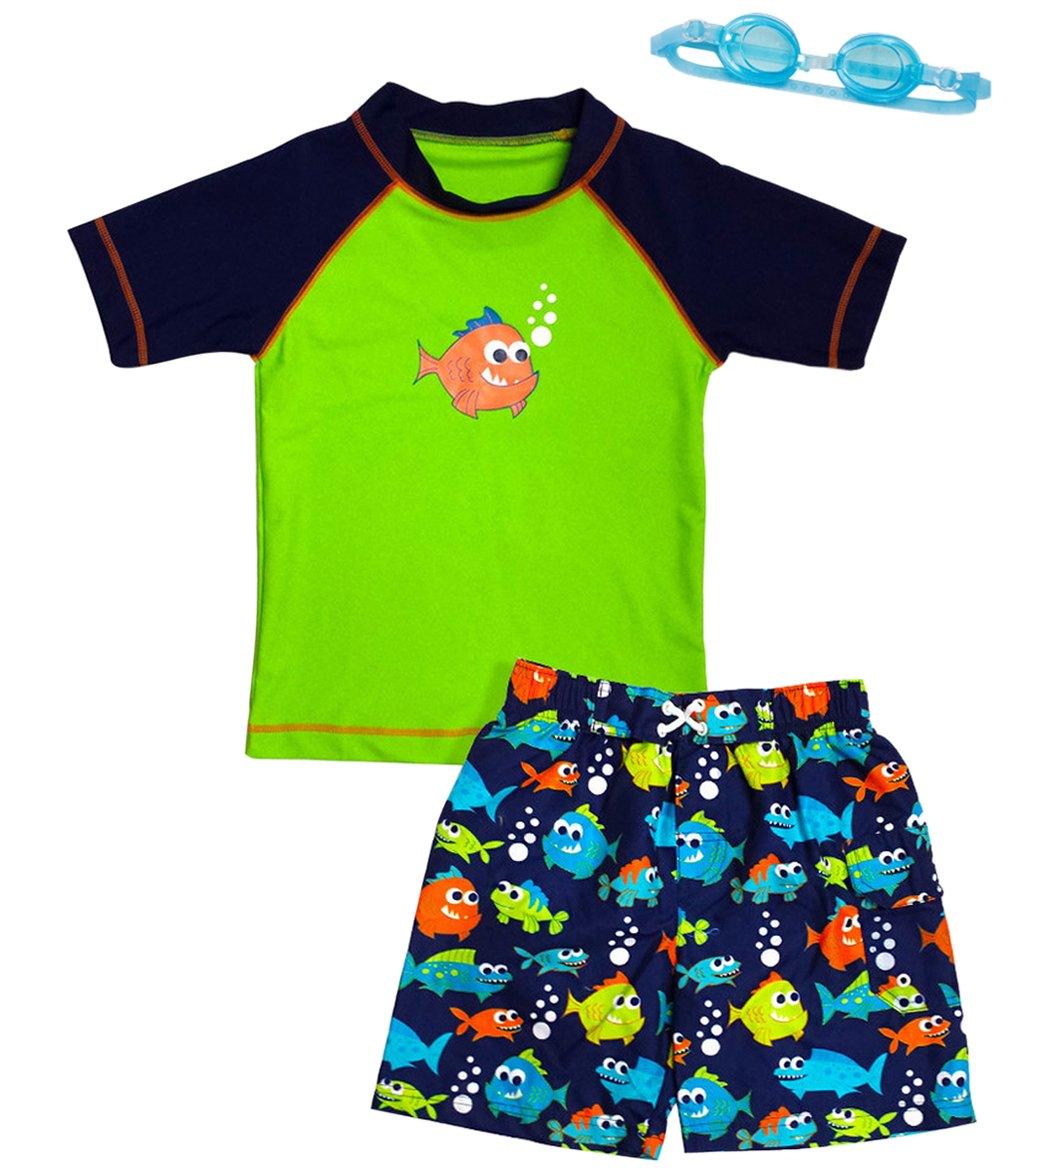 cc2de7fbd2 Jump N Splash Boy's Piranha Party Two-Piece Rashguard Set w/ Free Goggles (